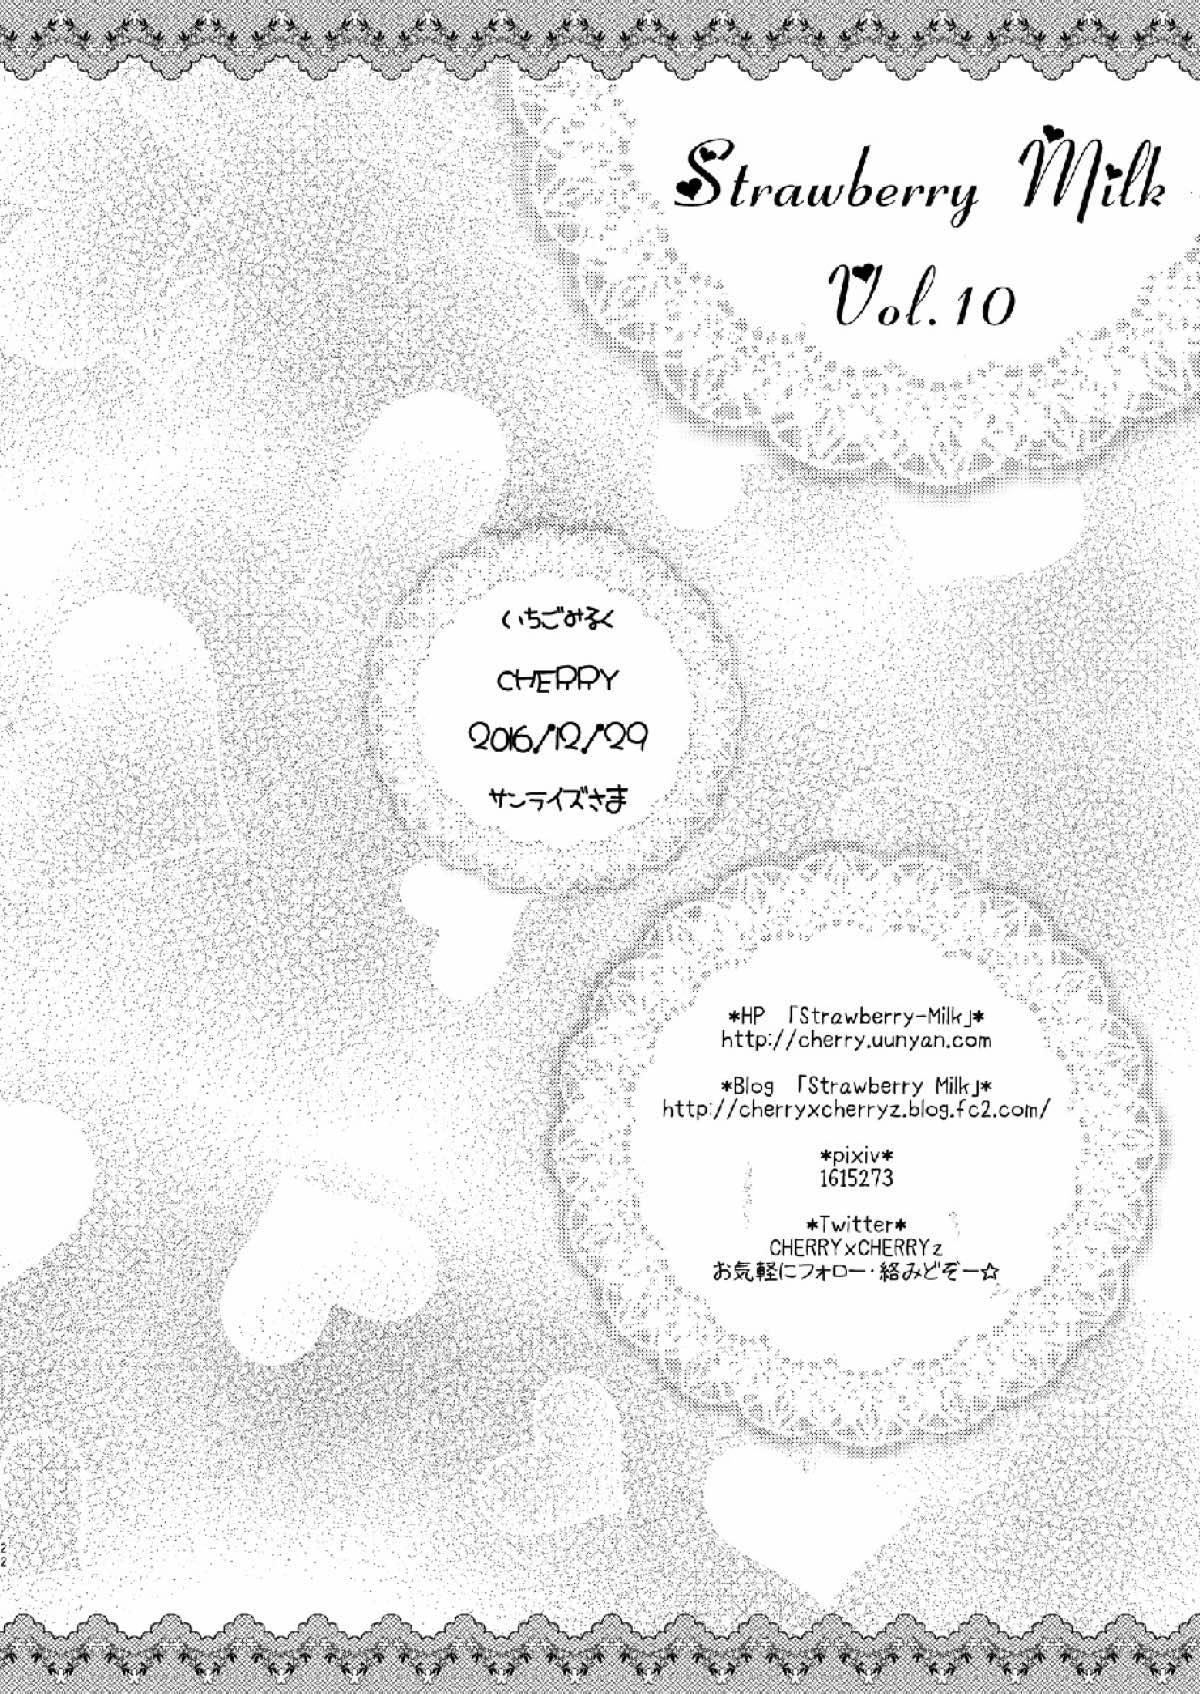 Strawberry Milk Vol. 10 20